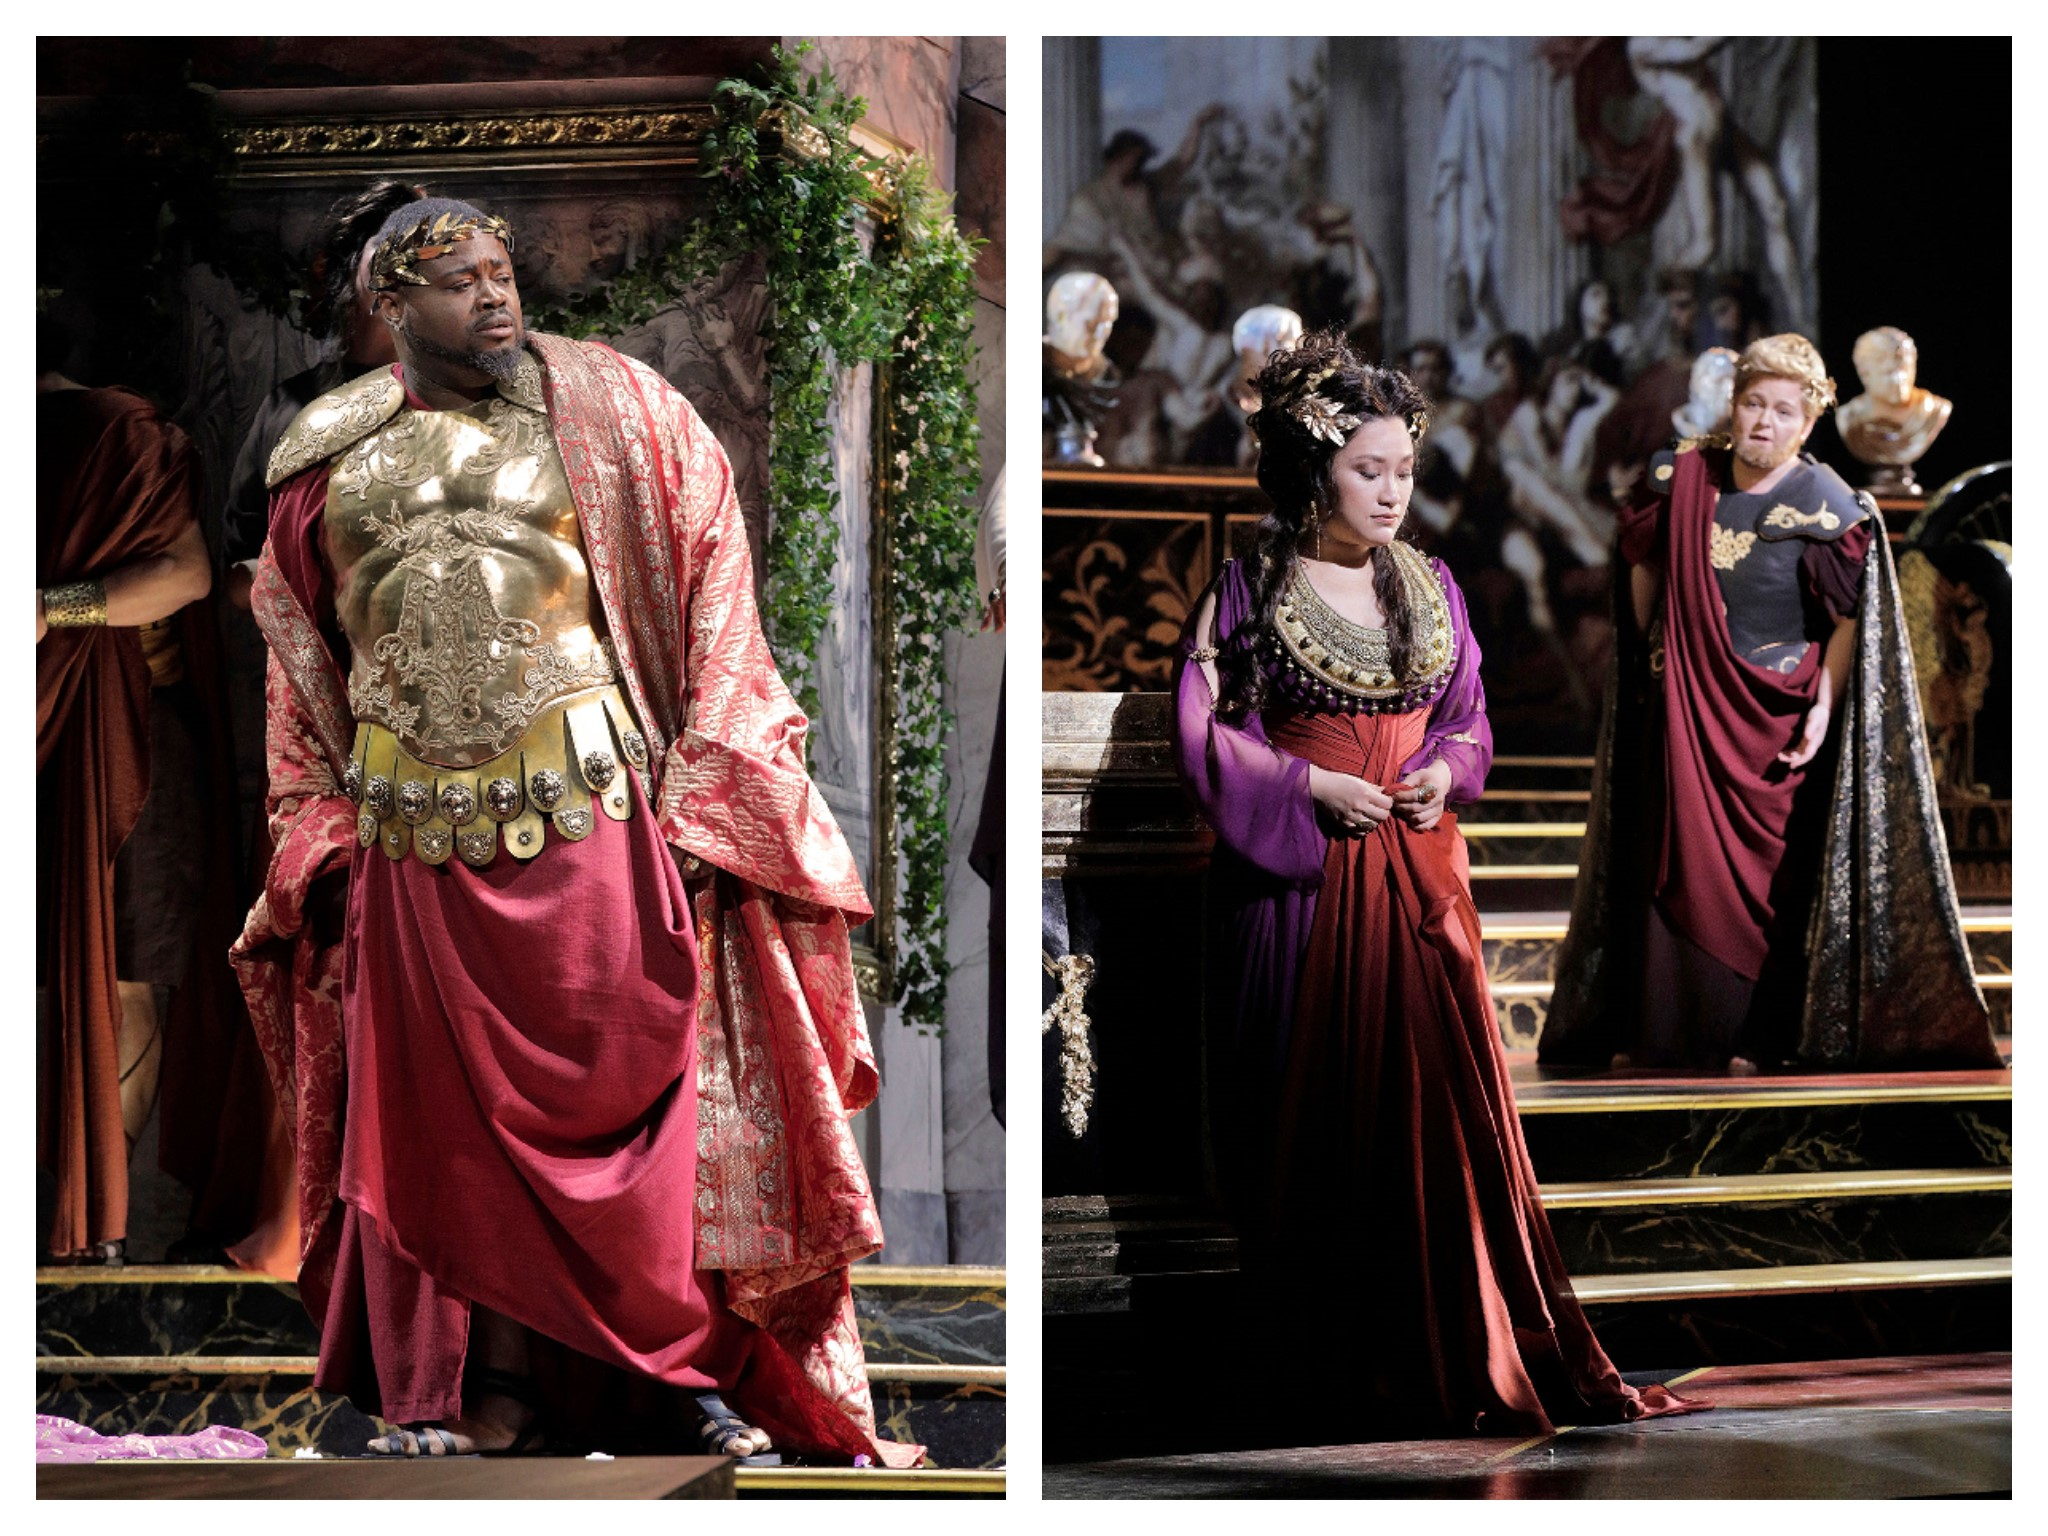 (L to R): Russell Thomas as Tito, Guangun Yu as Vitellia, Elizabeth DeShong as Sesto